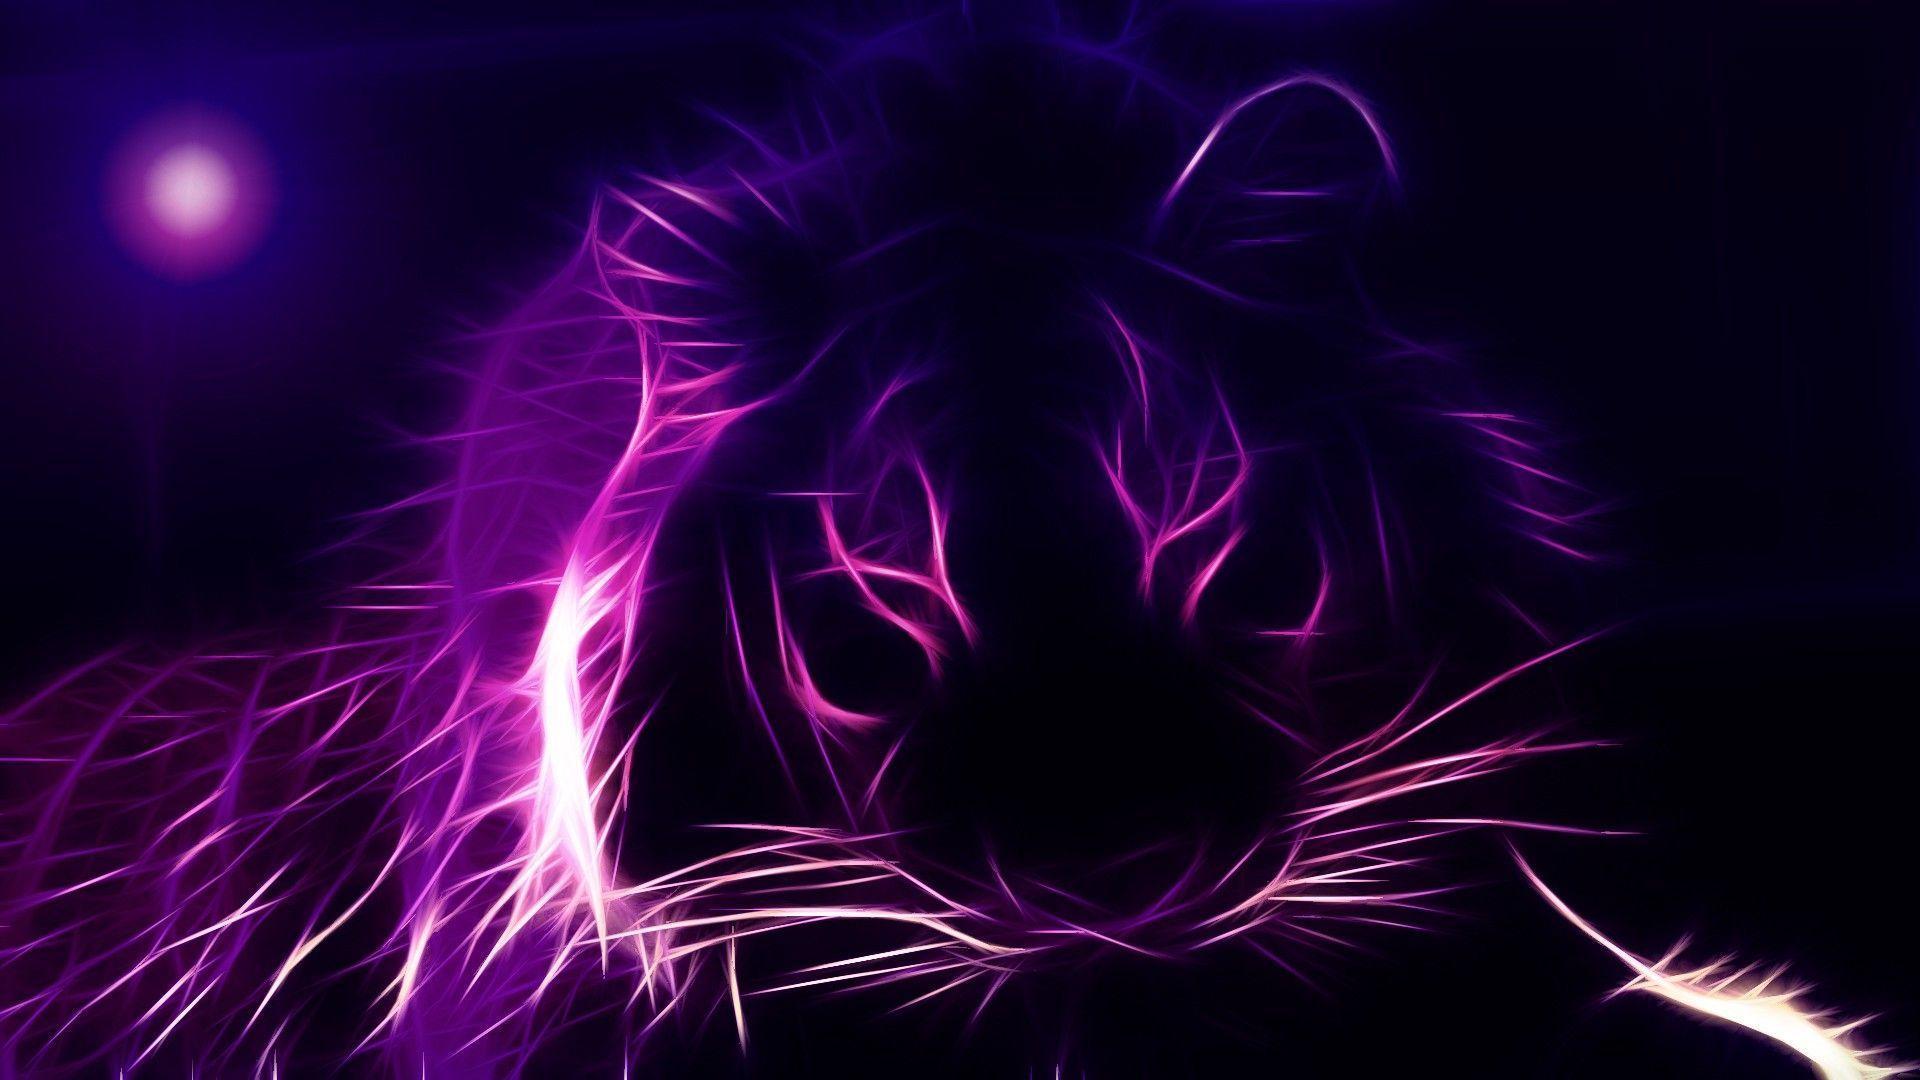 purple wallpapers hd wallpaper cave